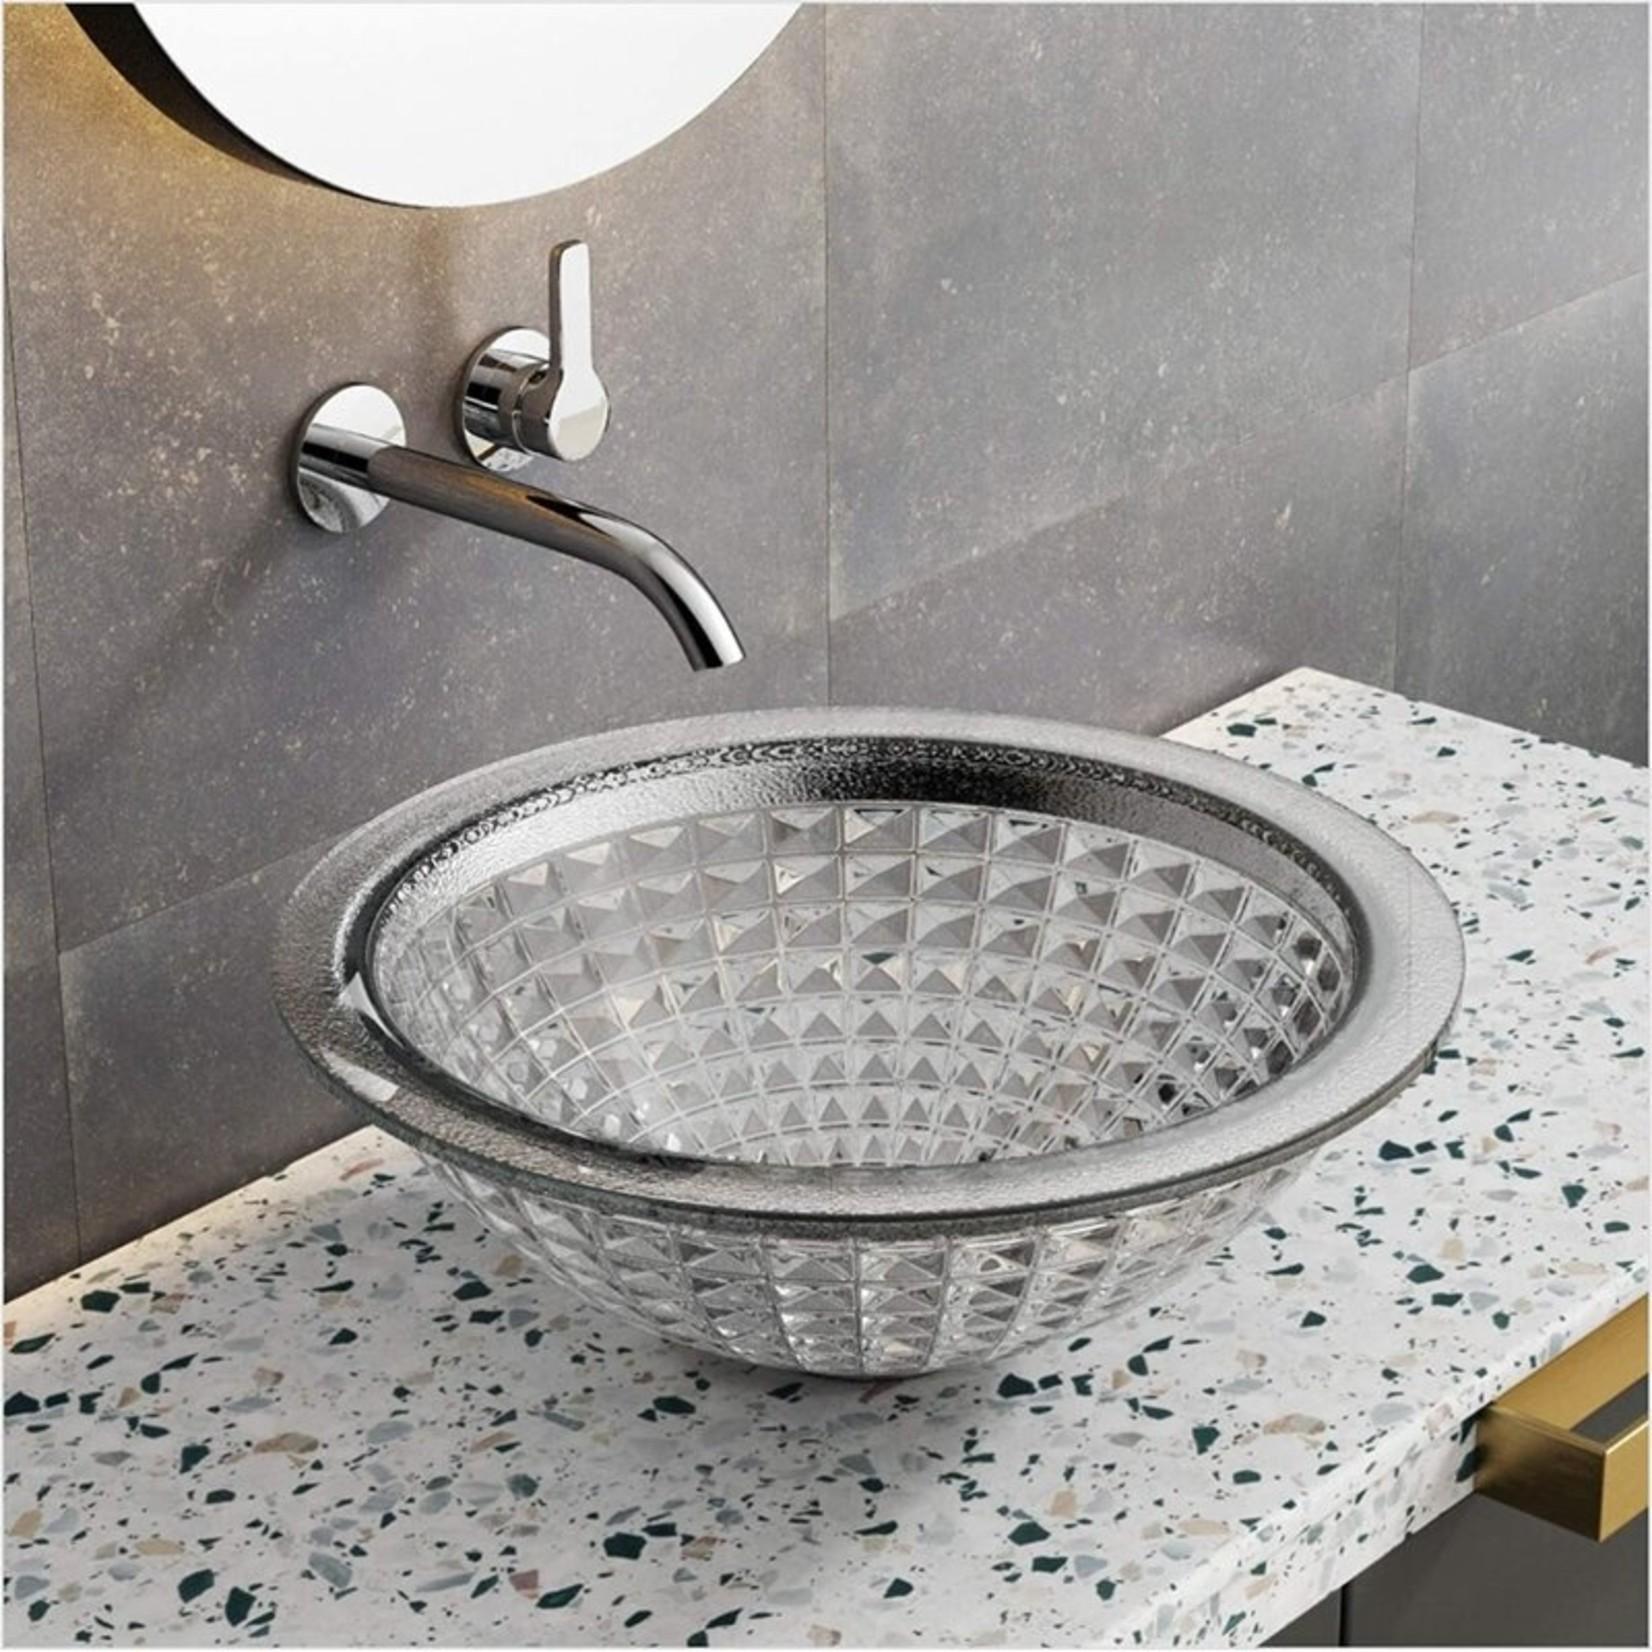 *Polished Silver Glass Handmade Circular Vessel Bathroom Sink